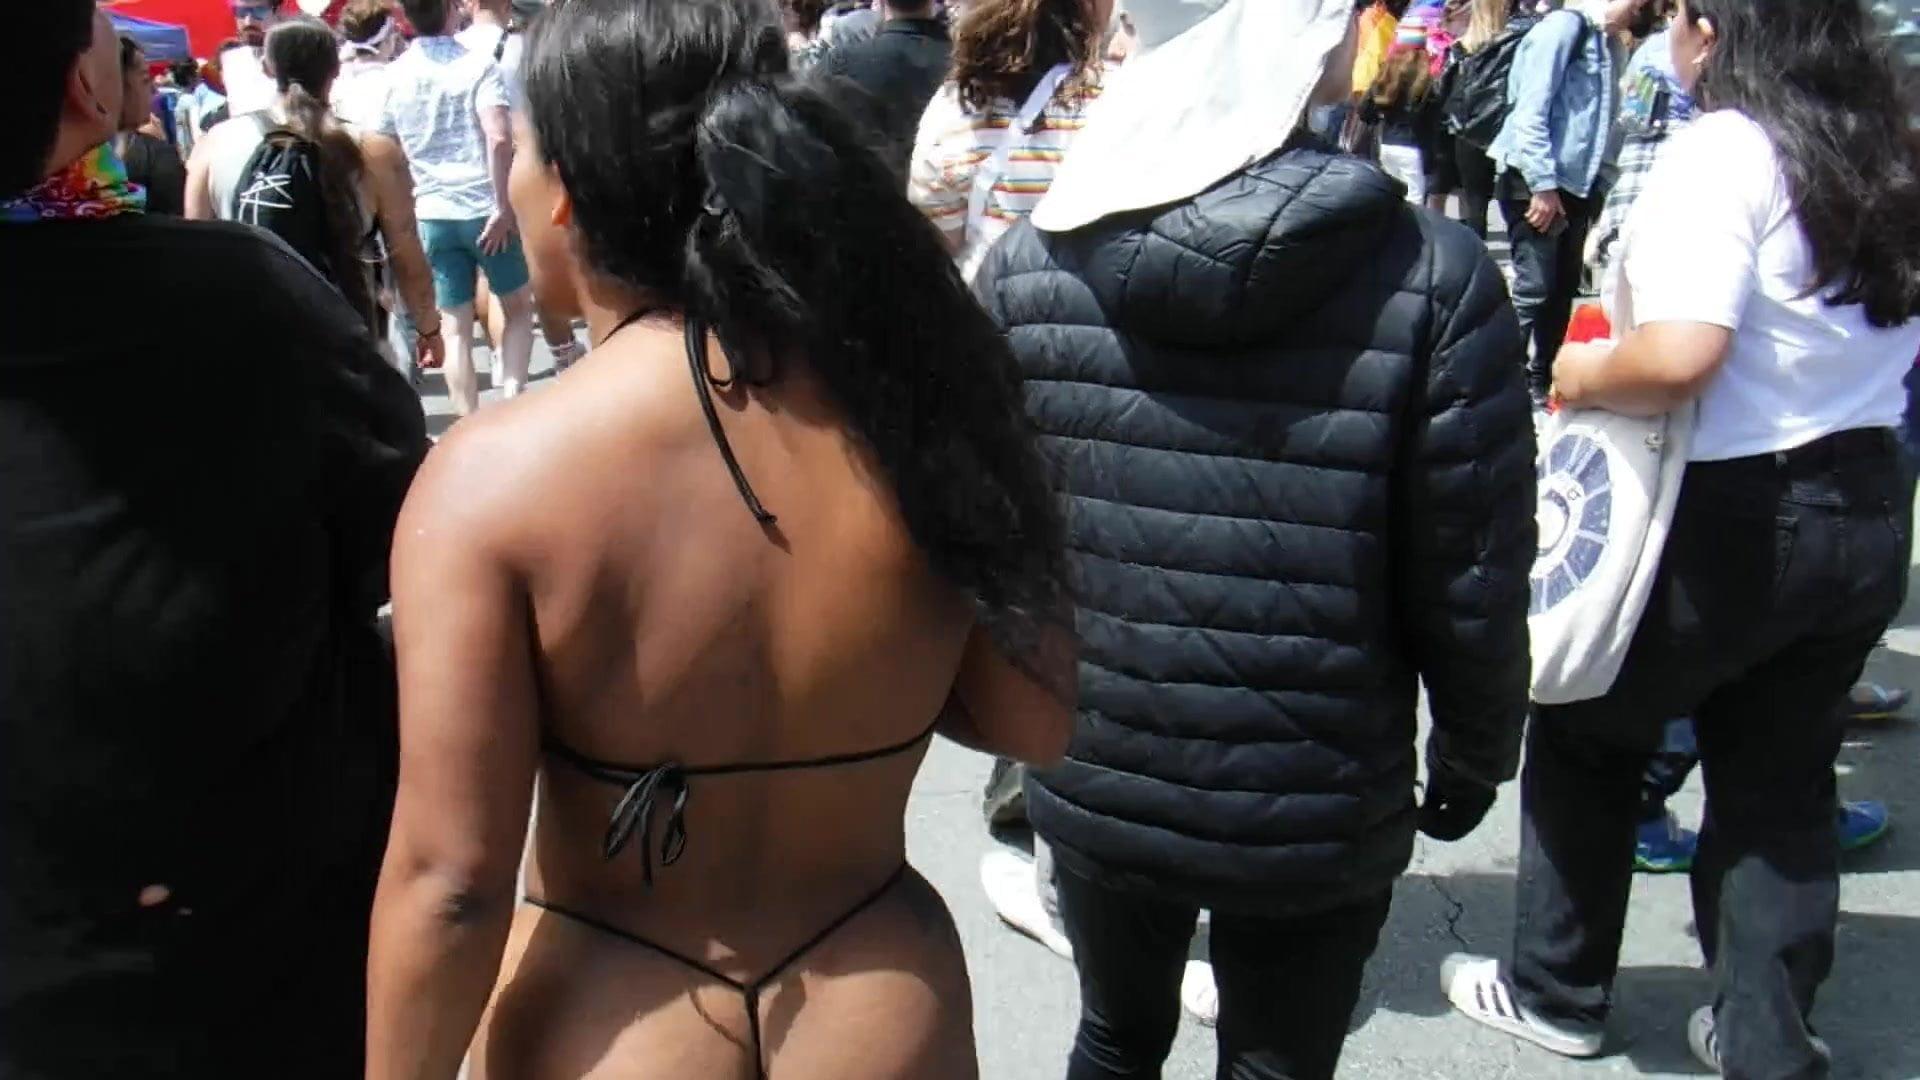 Delight Weekend 2019 – 14: Blasian String Bikini Amazon